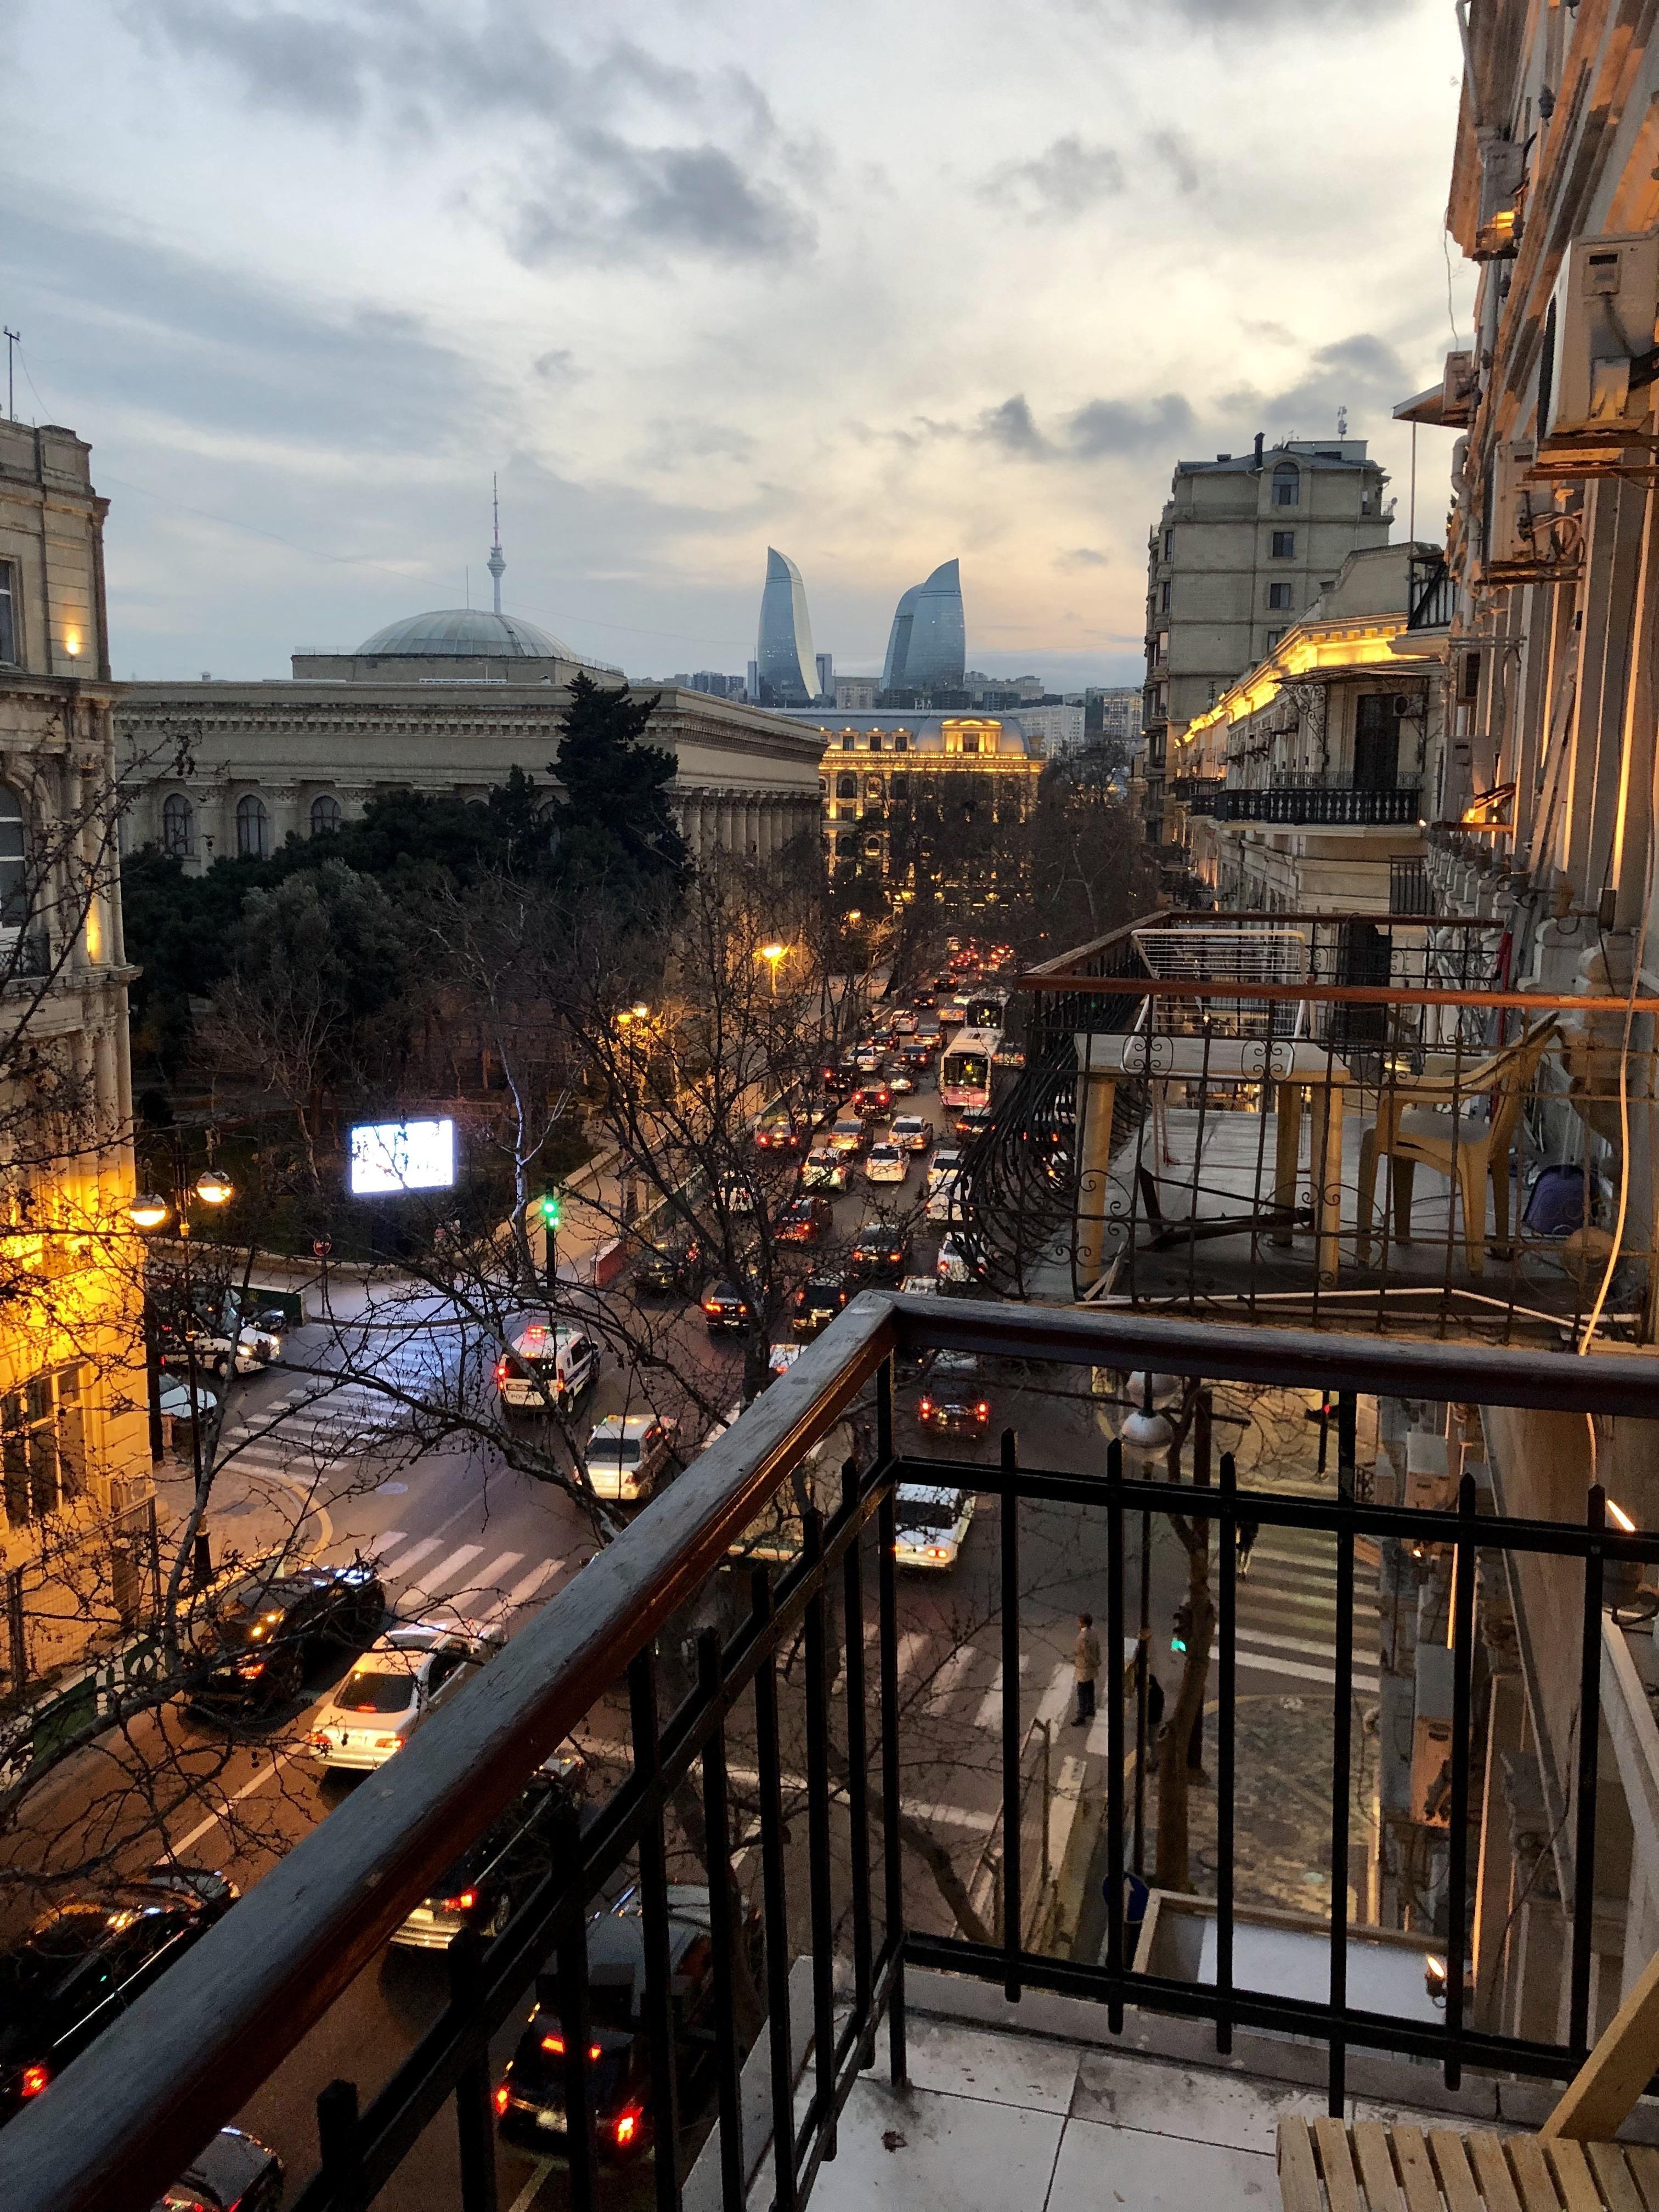 Baku Azerbaijan #city #cities #buildings #photography